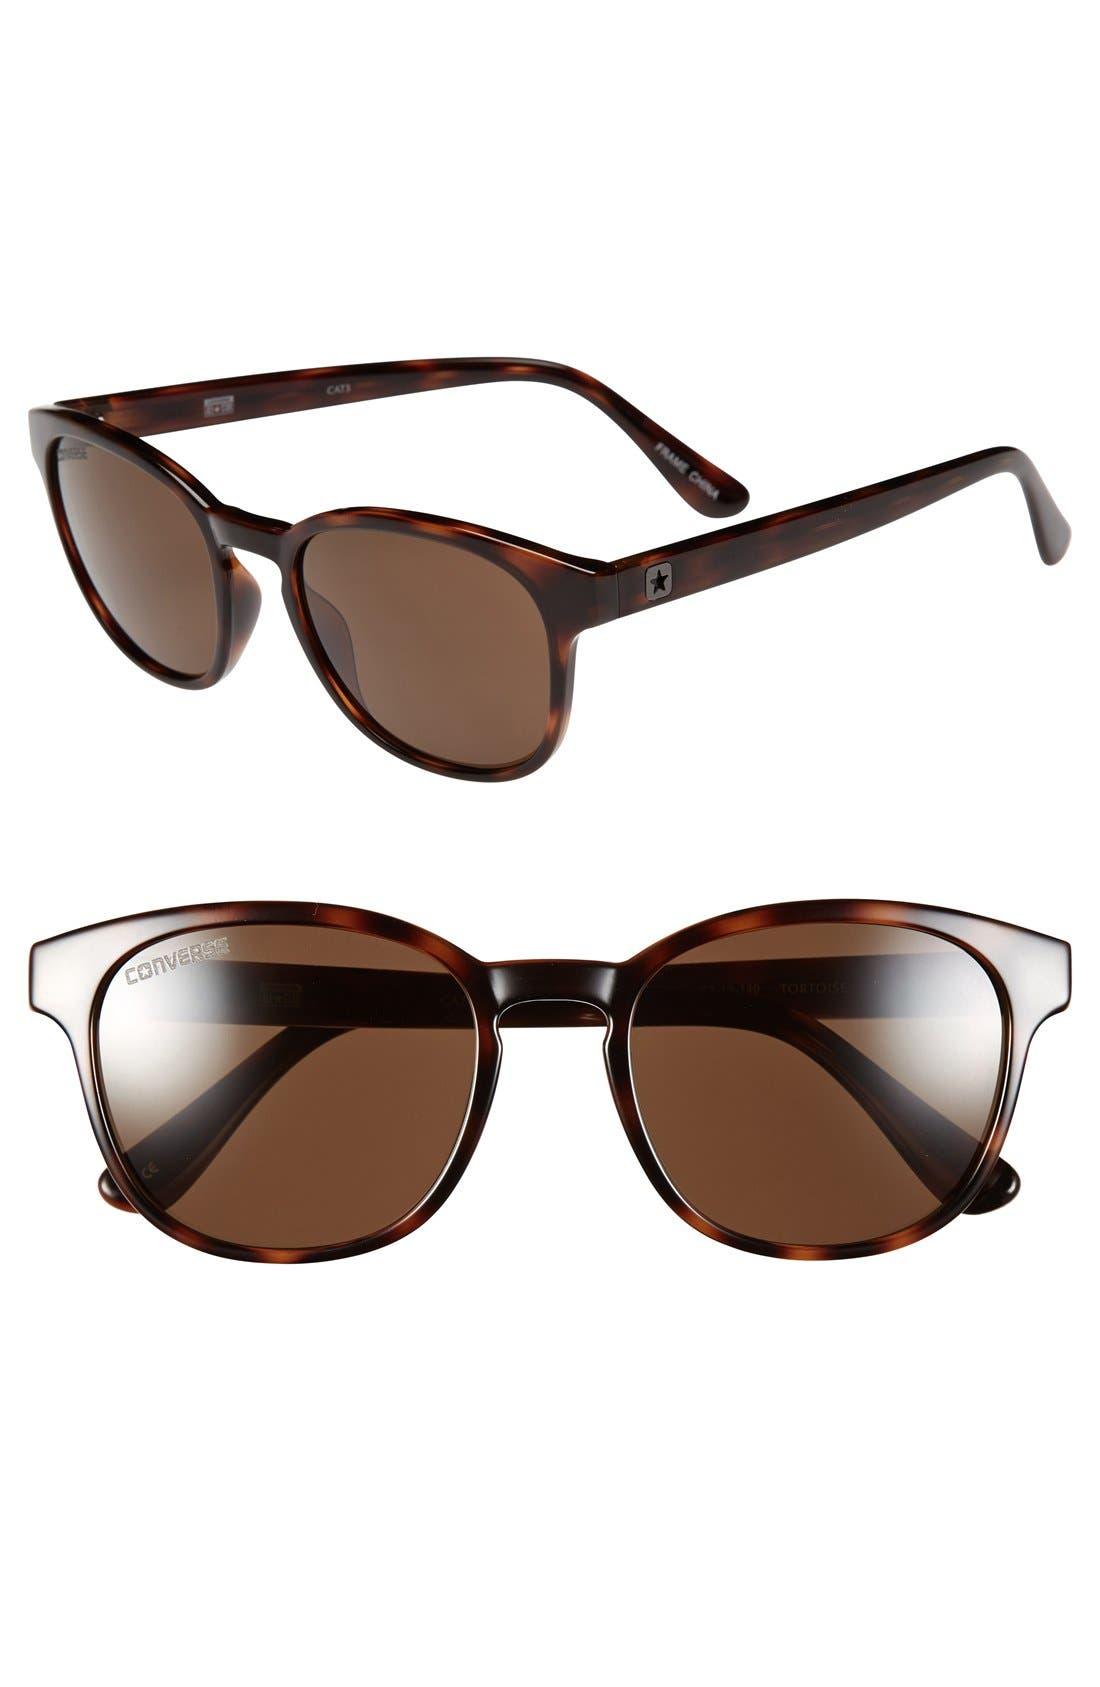 Alternate Image 1 Selected - Converse 52mm Retro Sunglasses